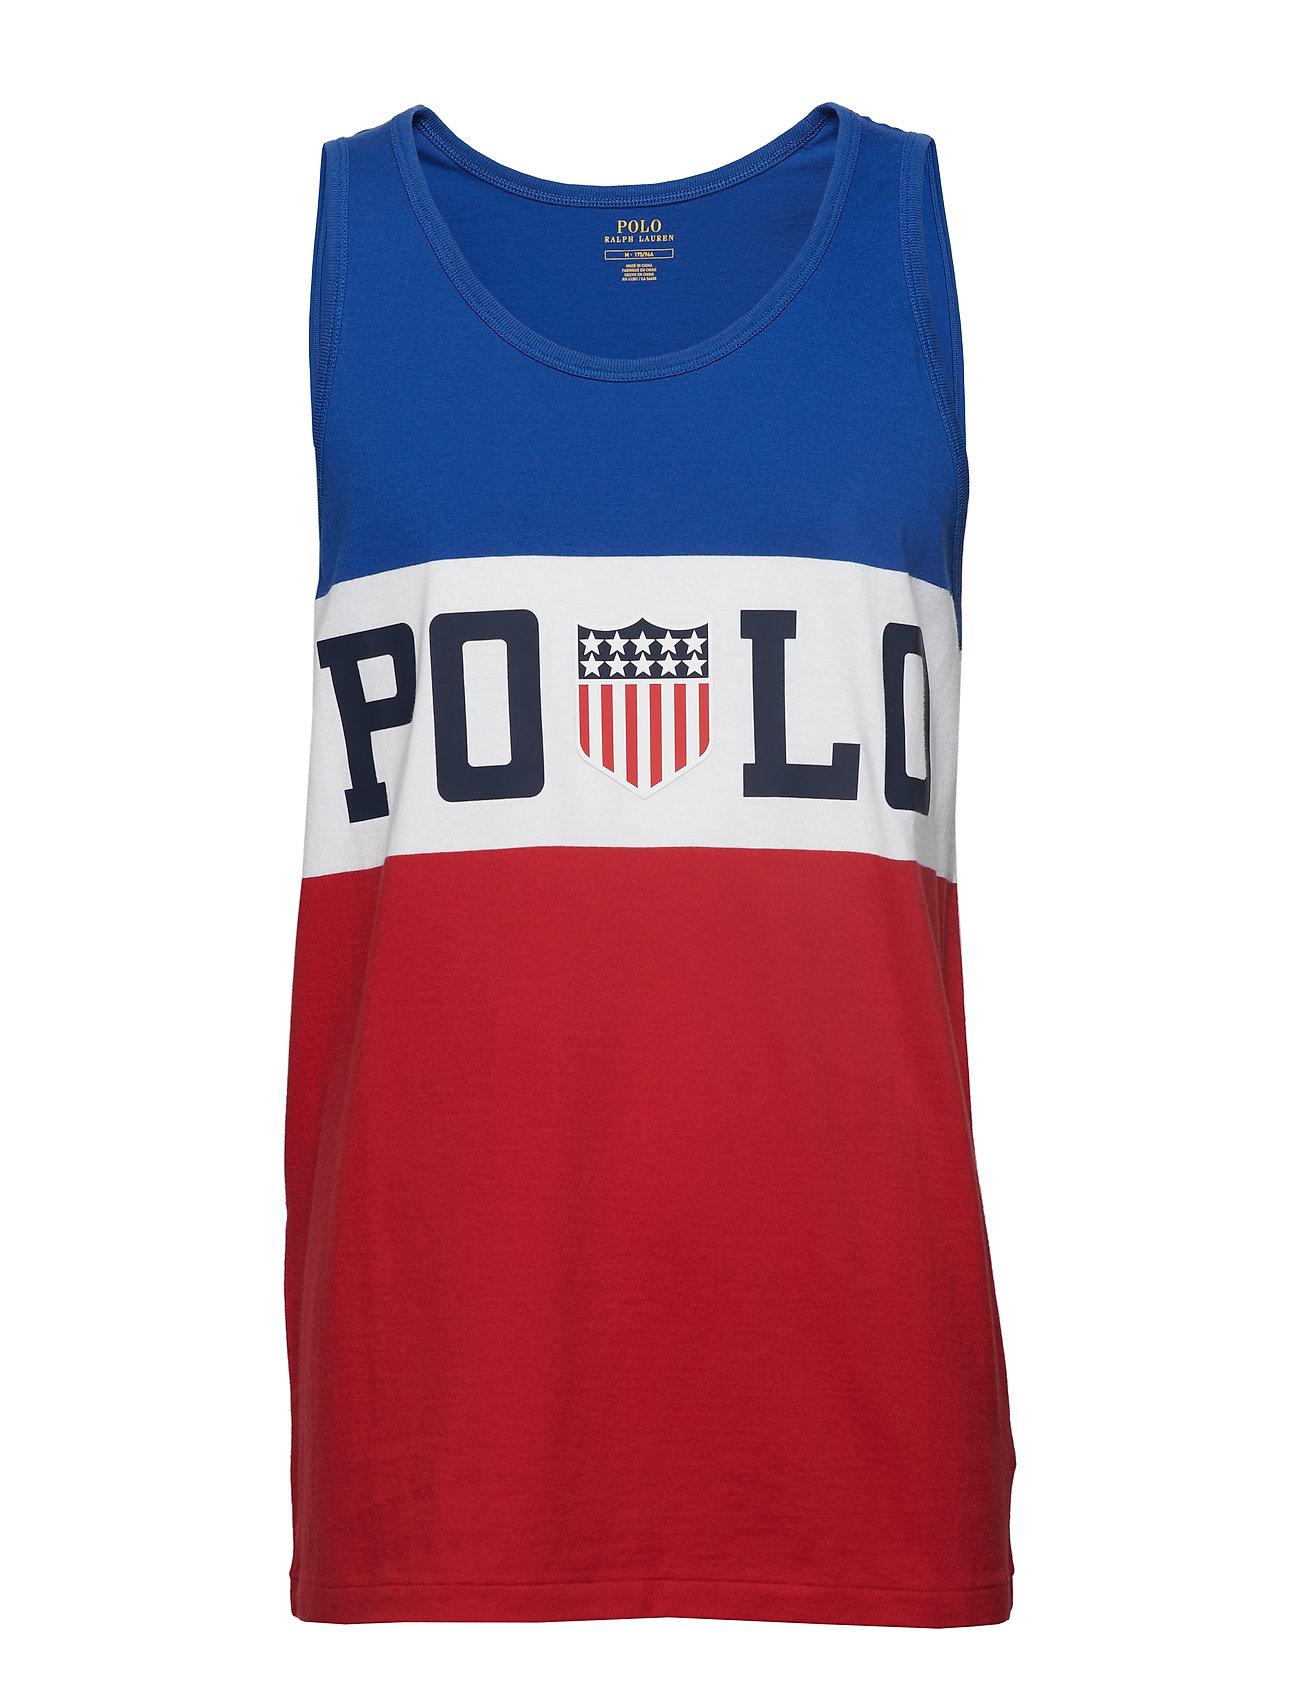 Polo Ralph Lauren Cotton Jersey Graphic Tank - SAPPHIRE STAR MUL